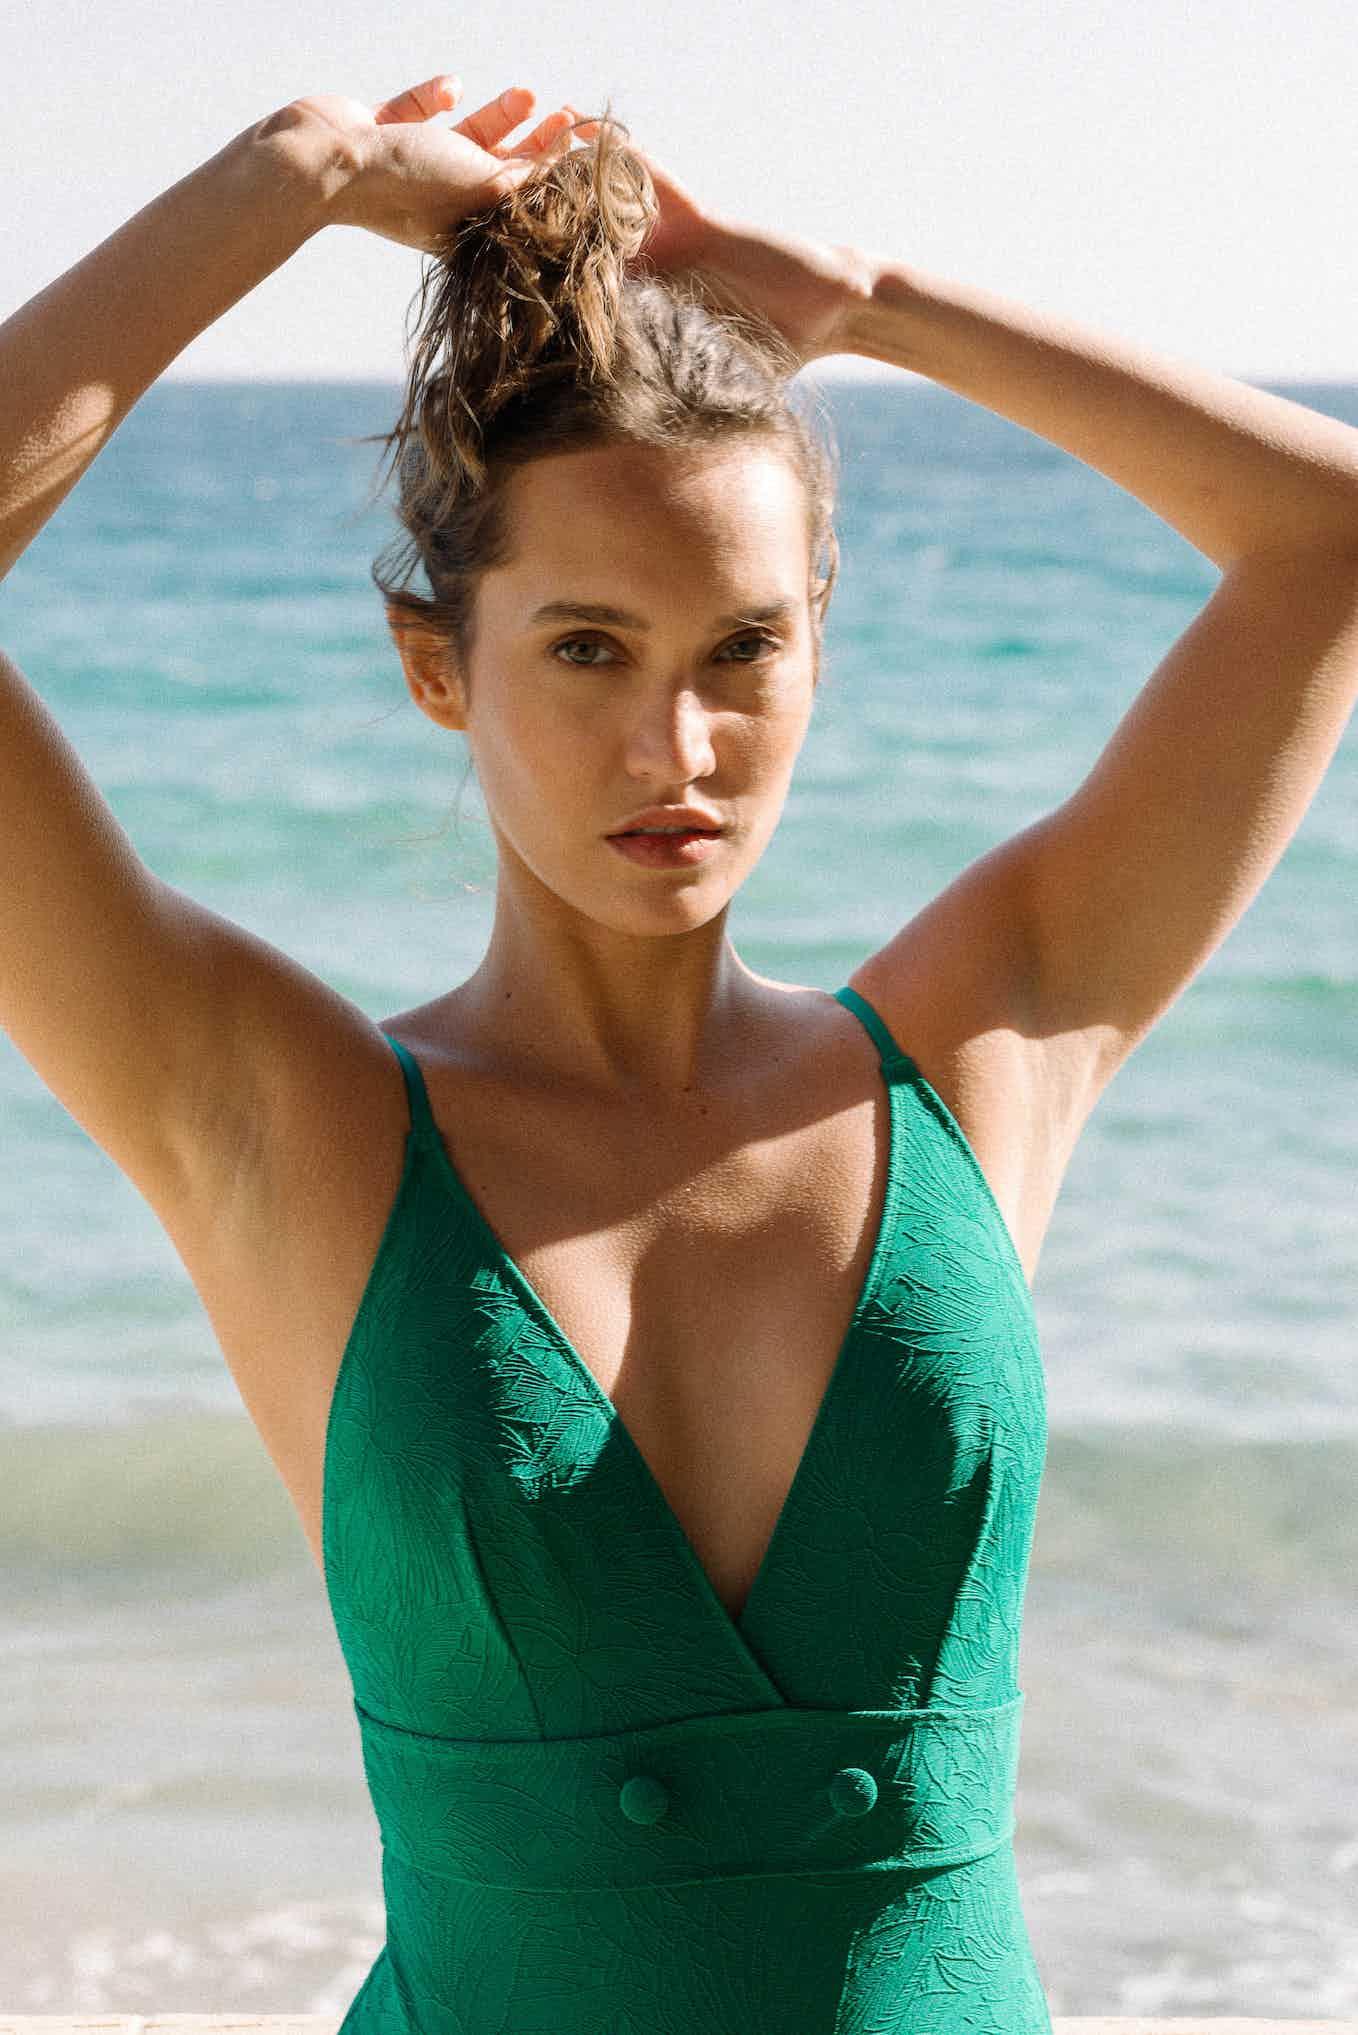 Rêve ensoleillé swimsuit in emerald green